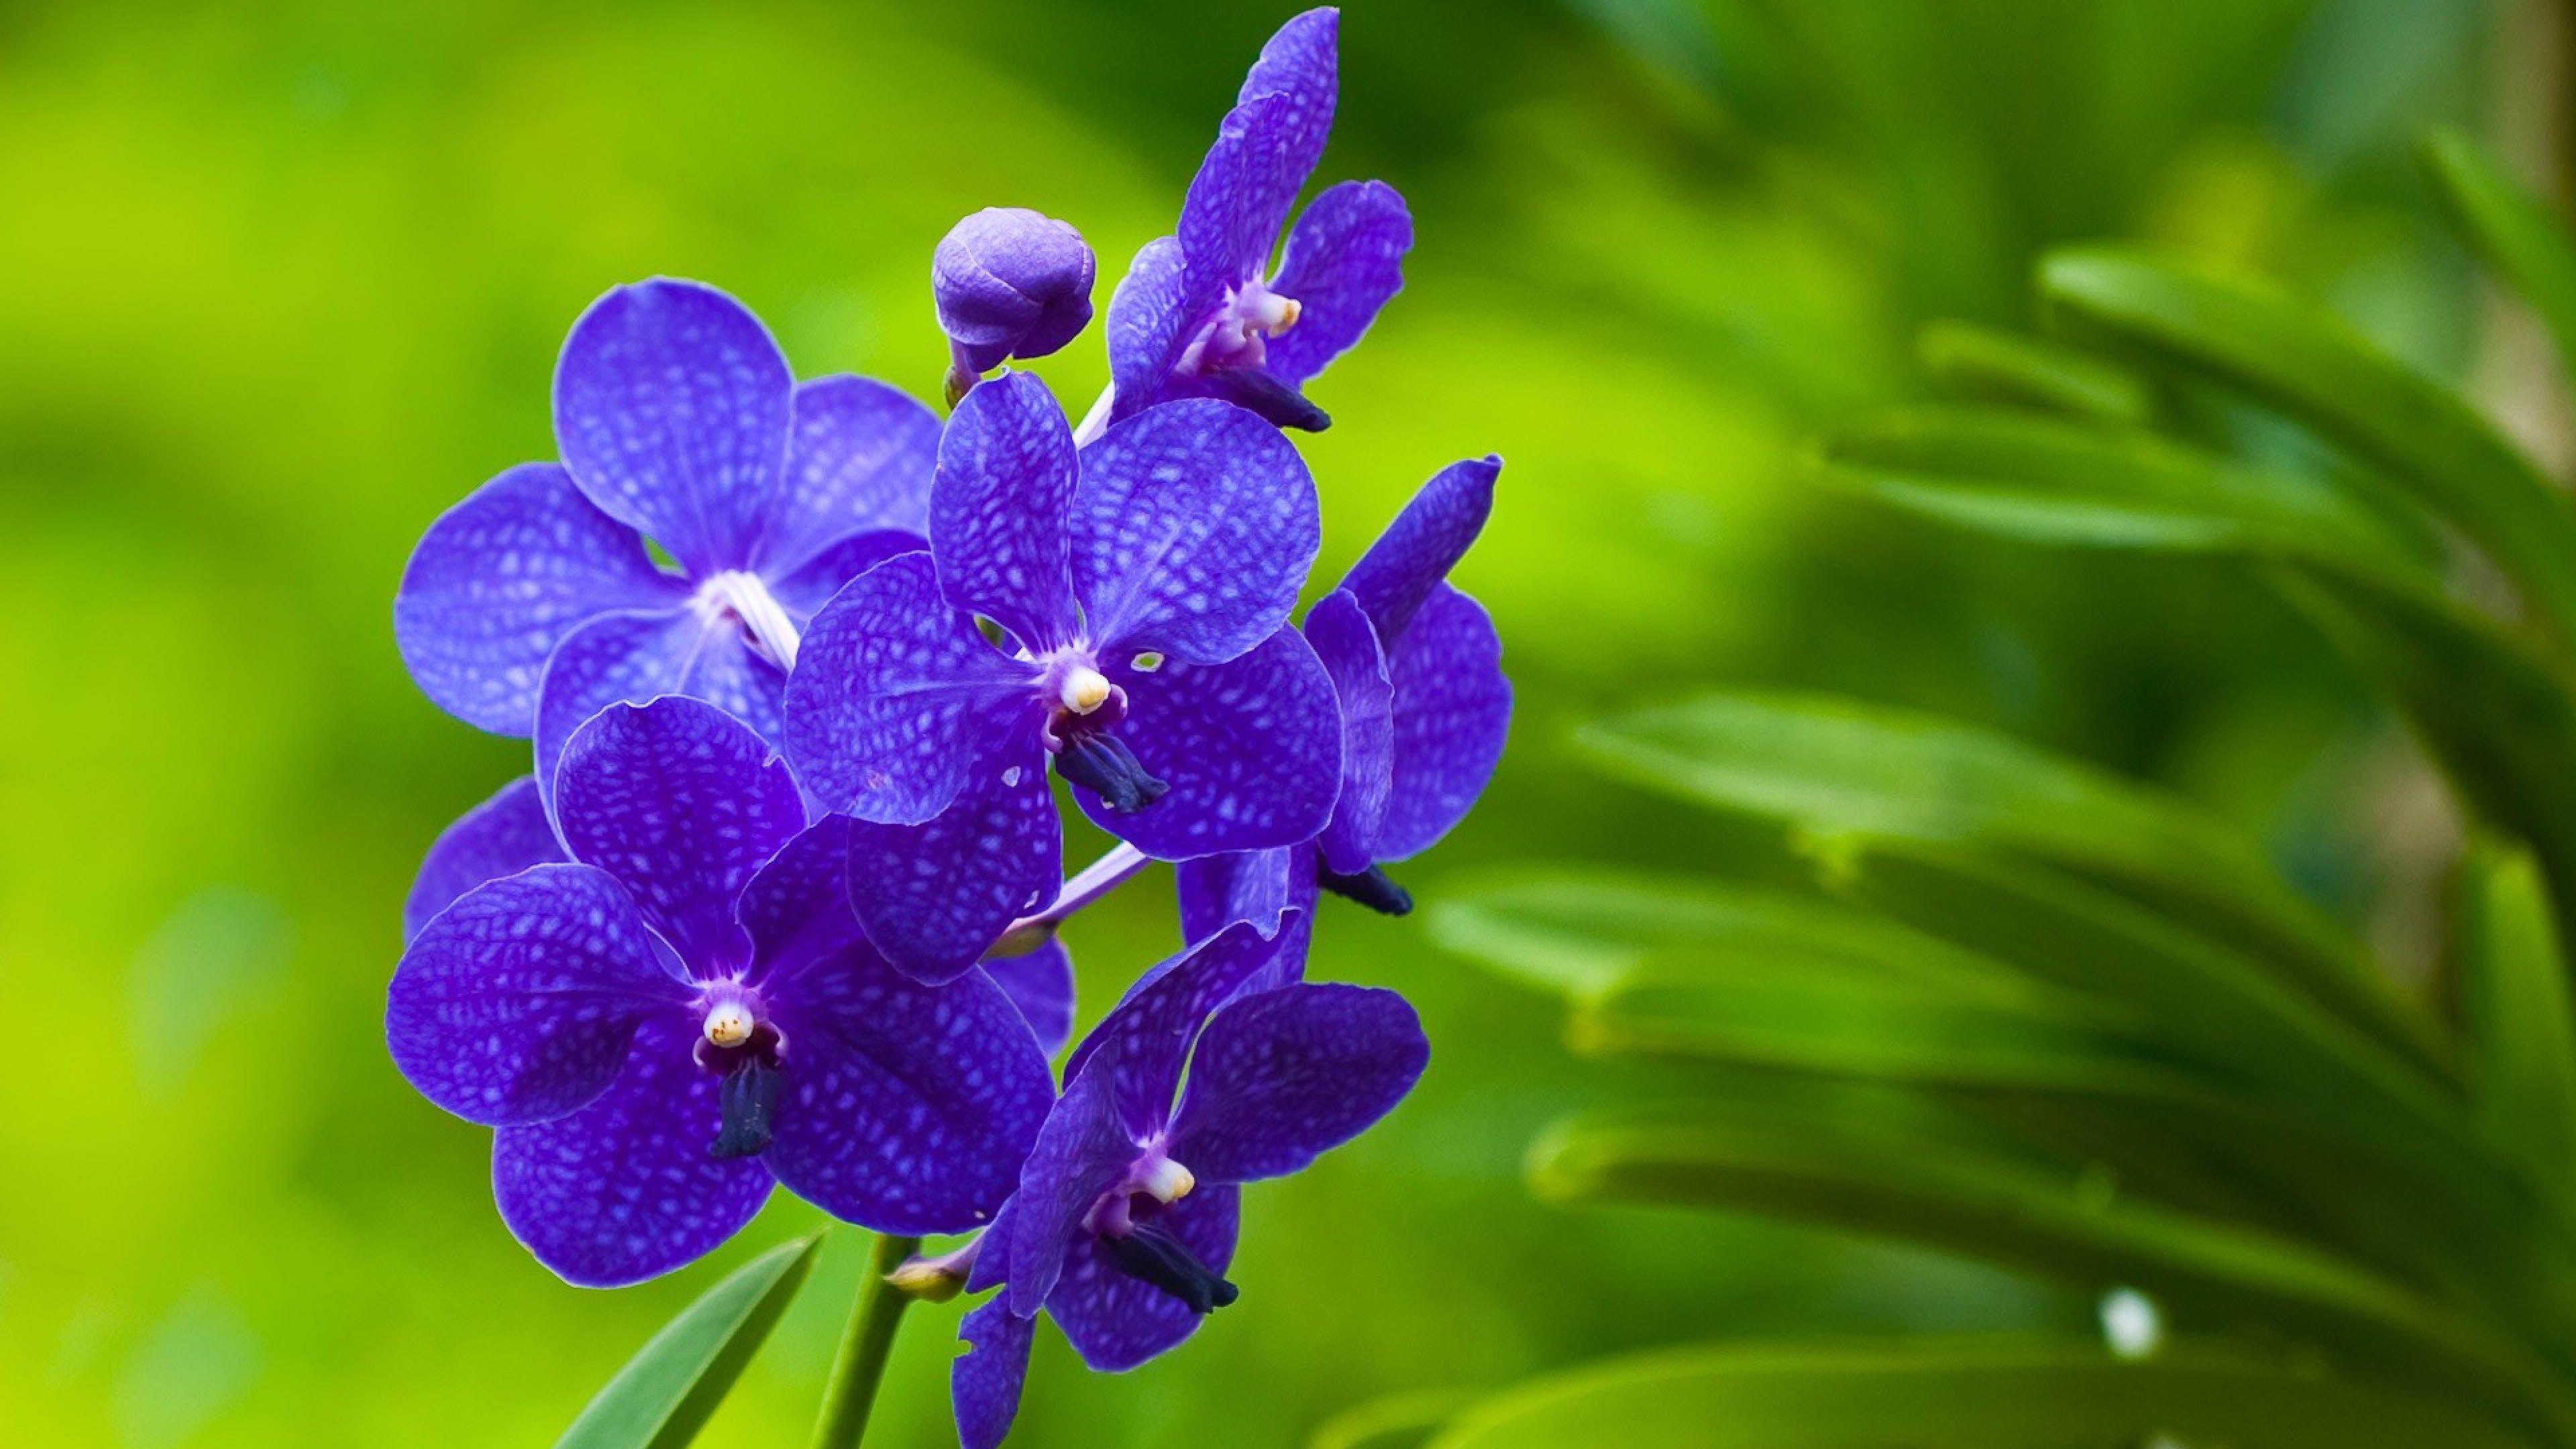 Amazing Close Up On Purple Flower 3840x2160 4k 16 9 Ultra Hd Orchid Wallpaper Flower Iphone Wallpaper Purple Flowers Wallpaper